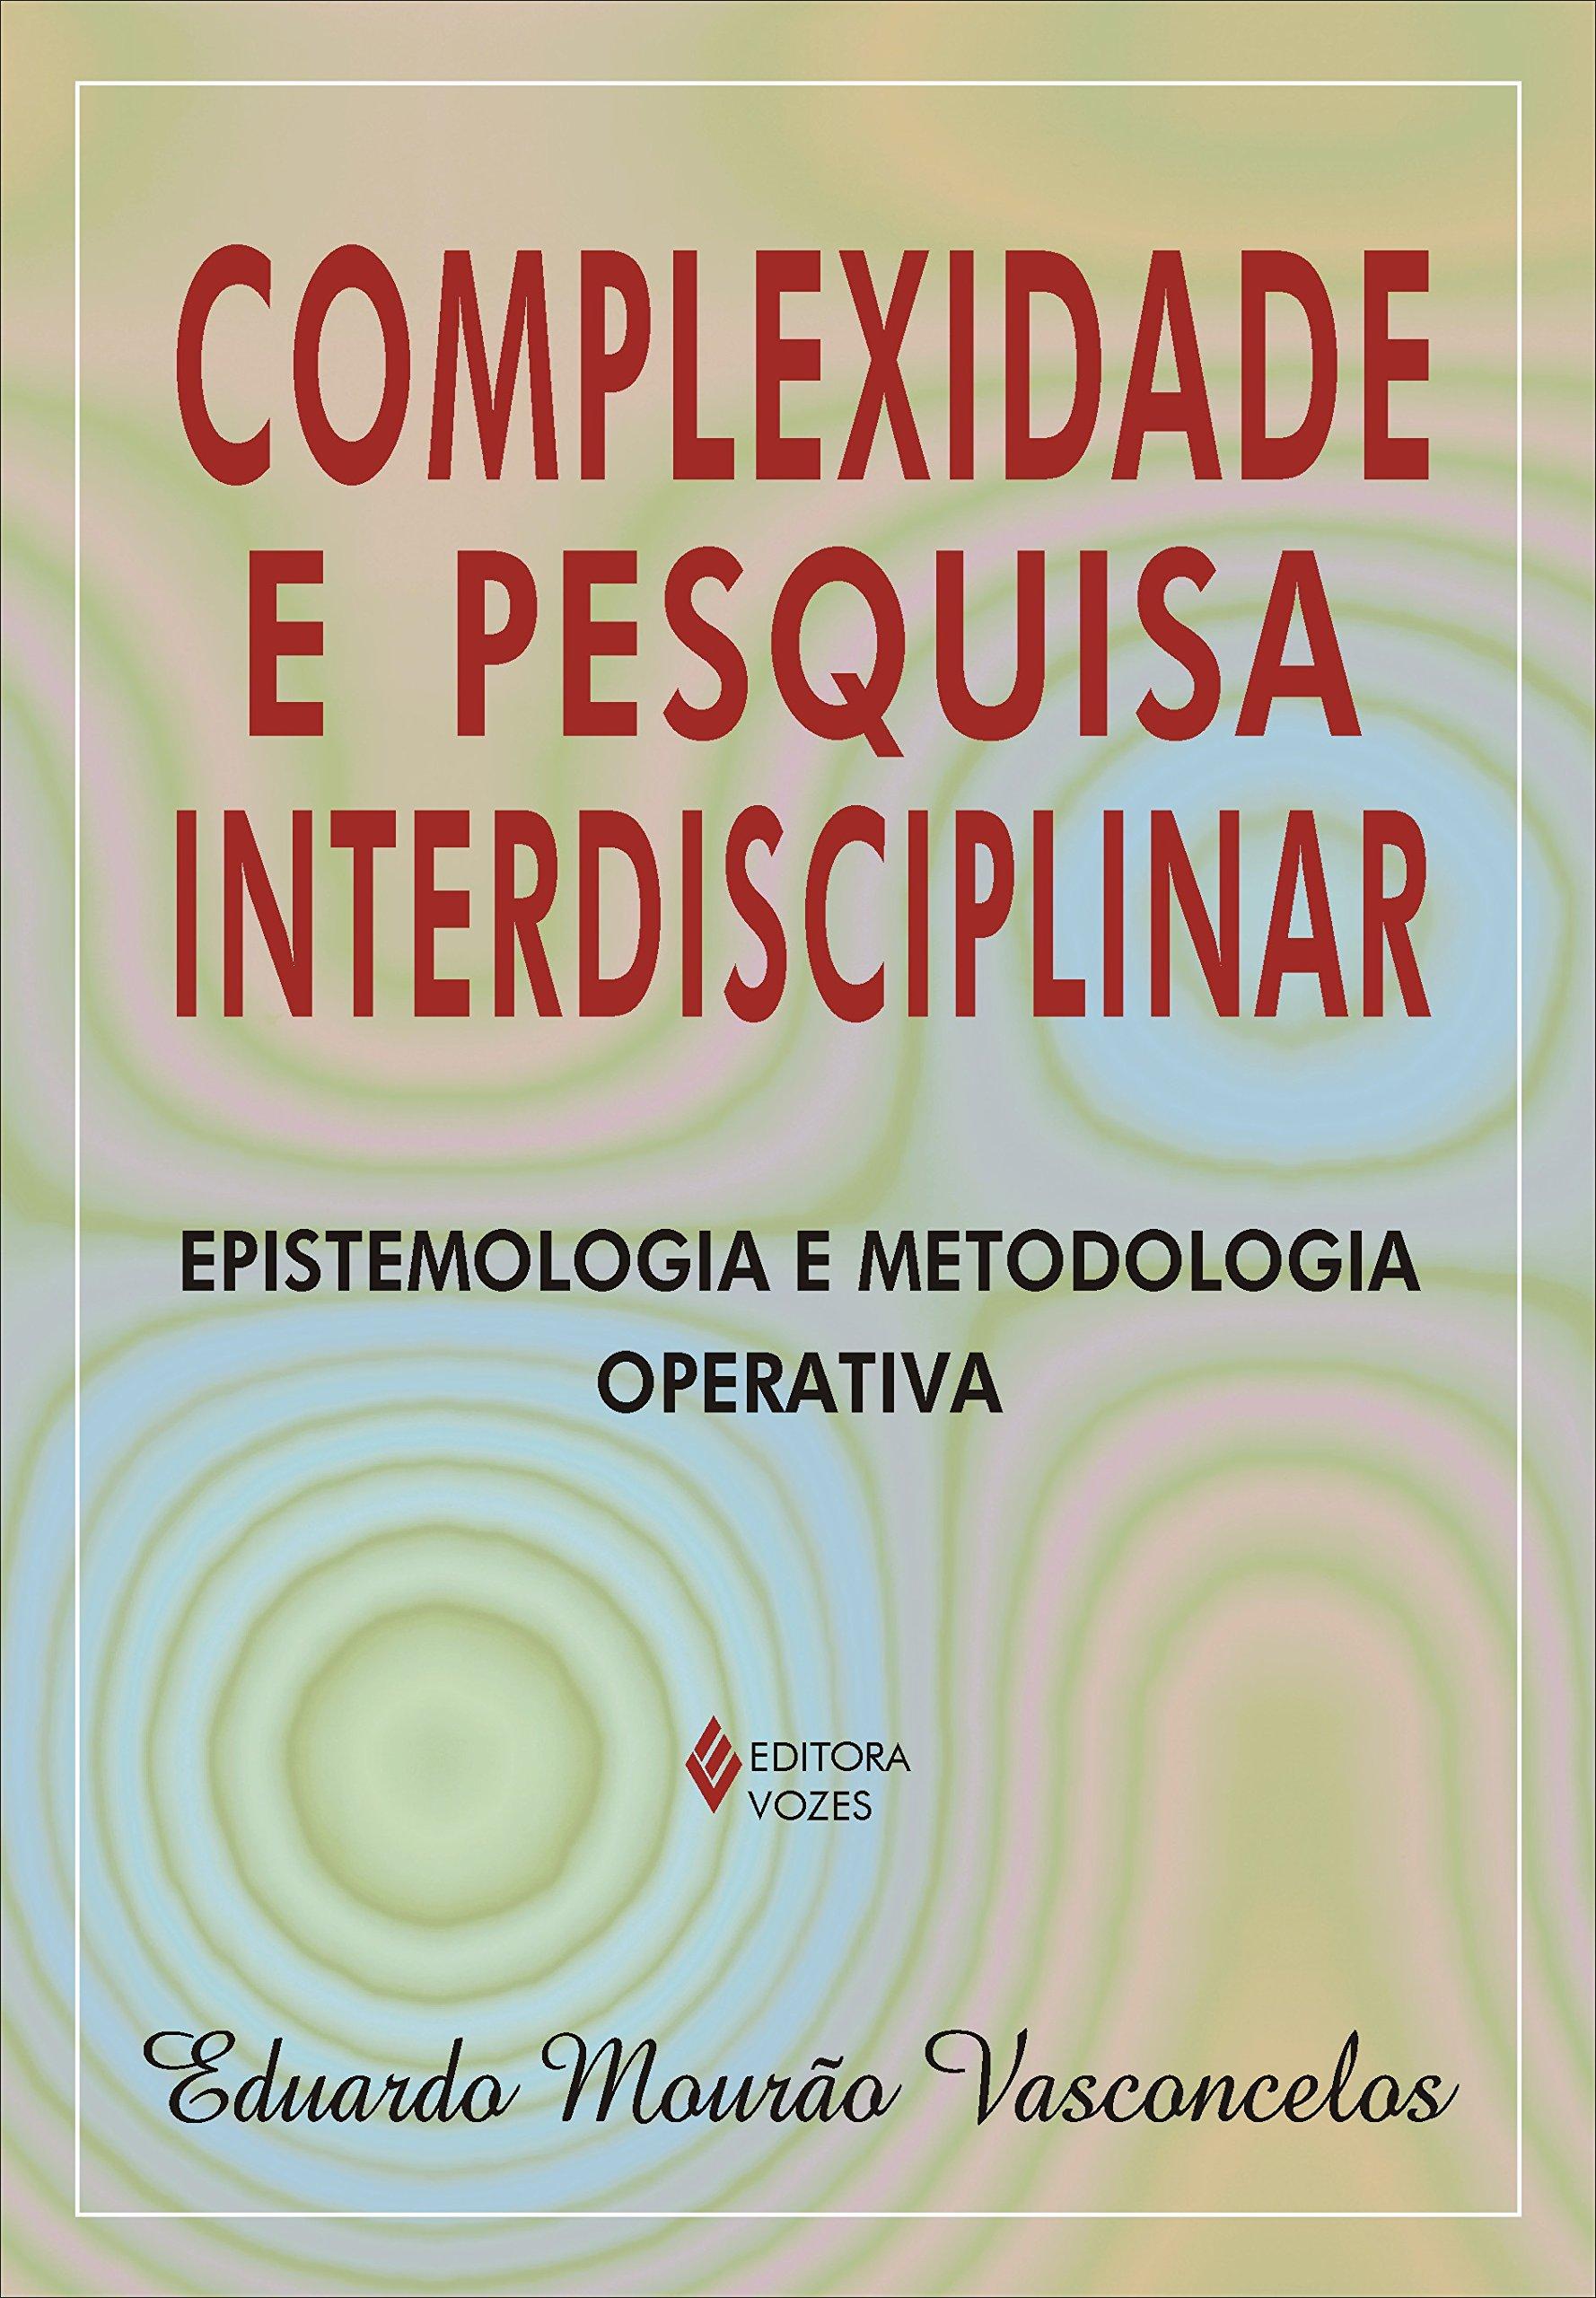 Read Online Complexidade e Pesquisa Interdisciplinar: Epistemologia e Metodologia Operativa pdf epub